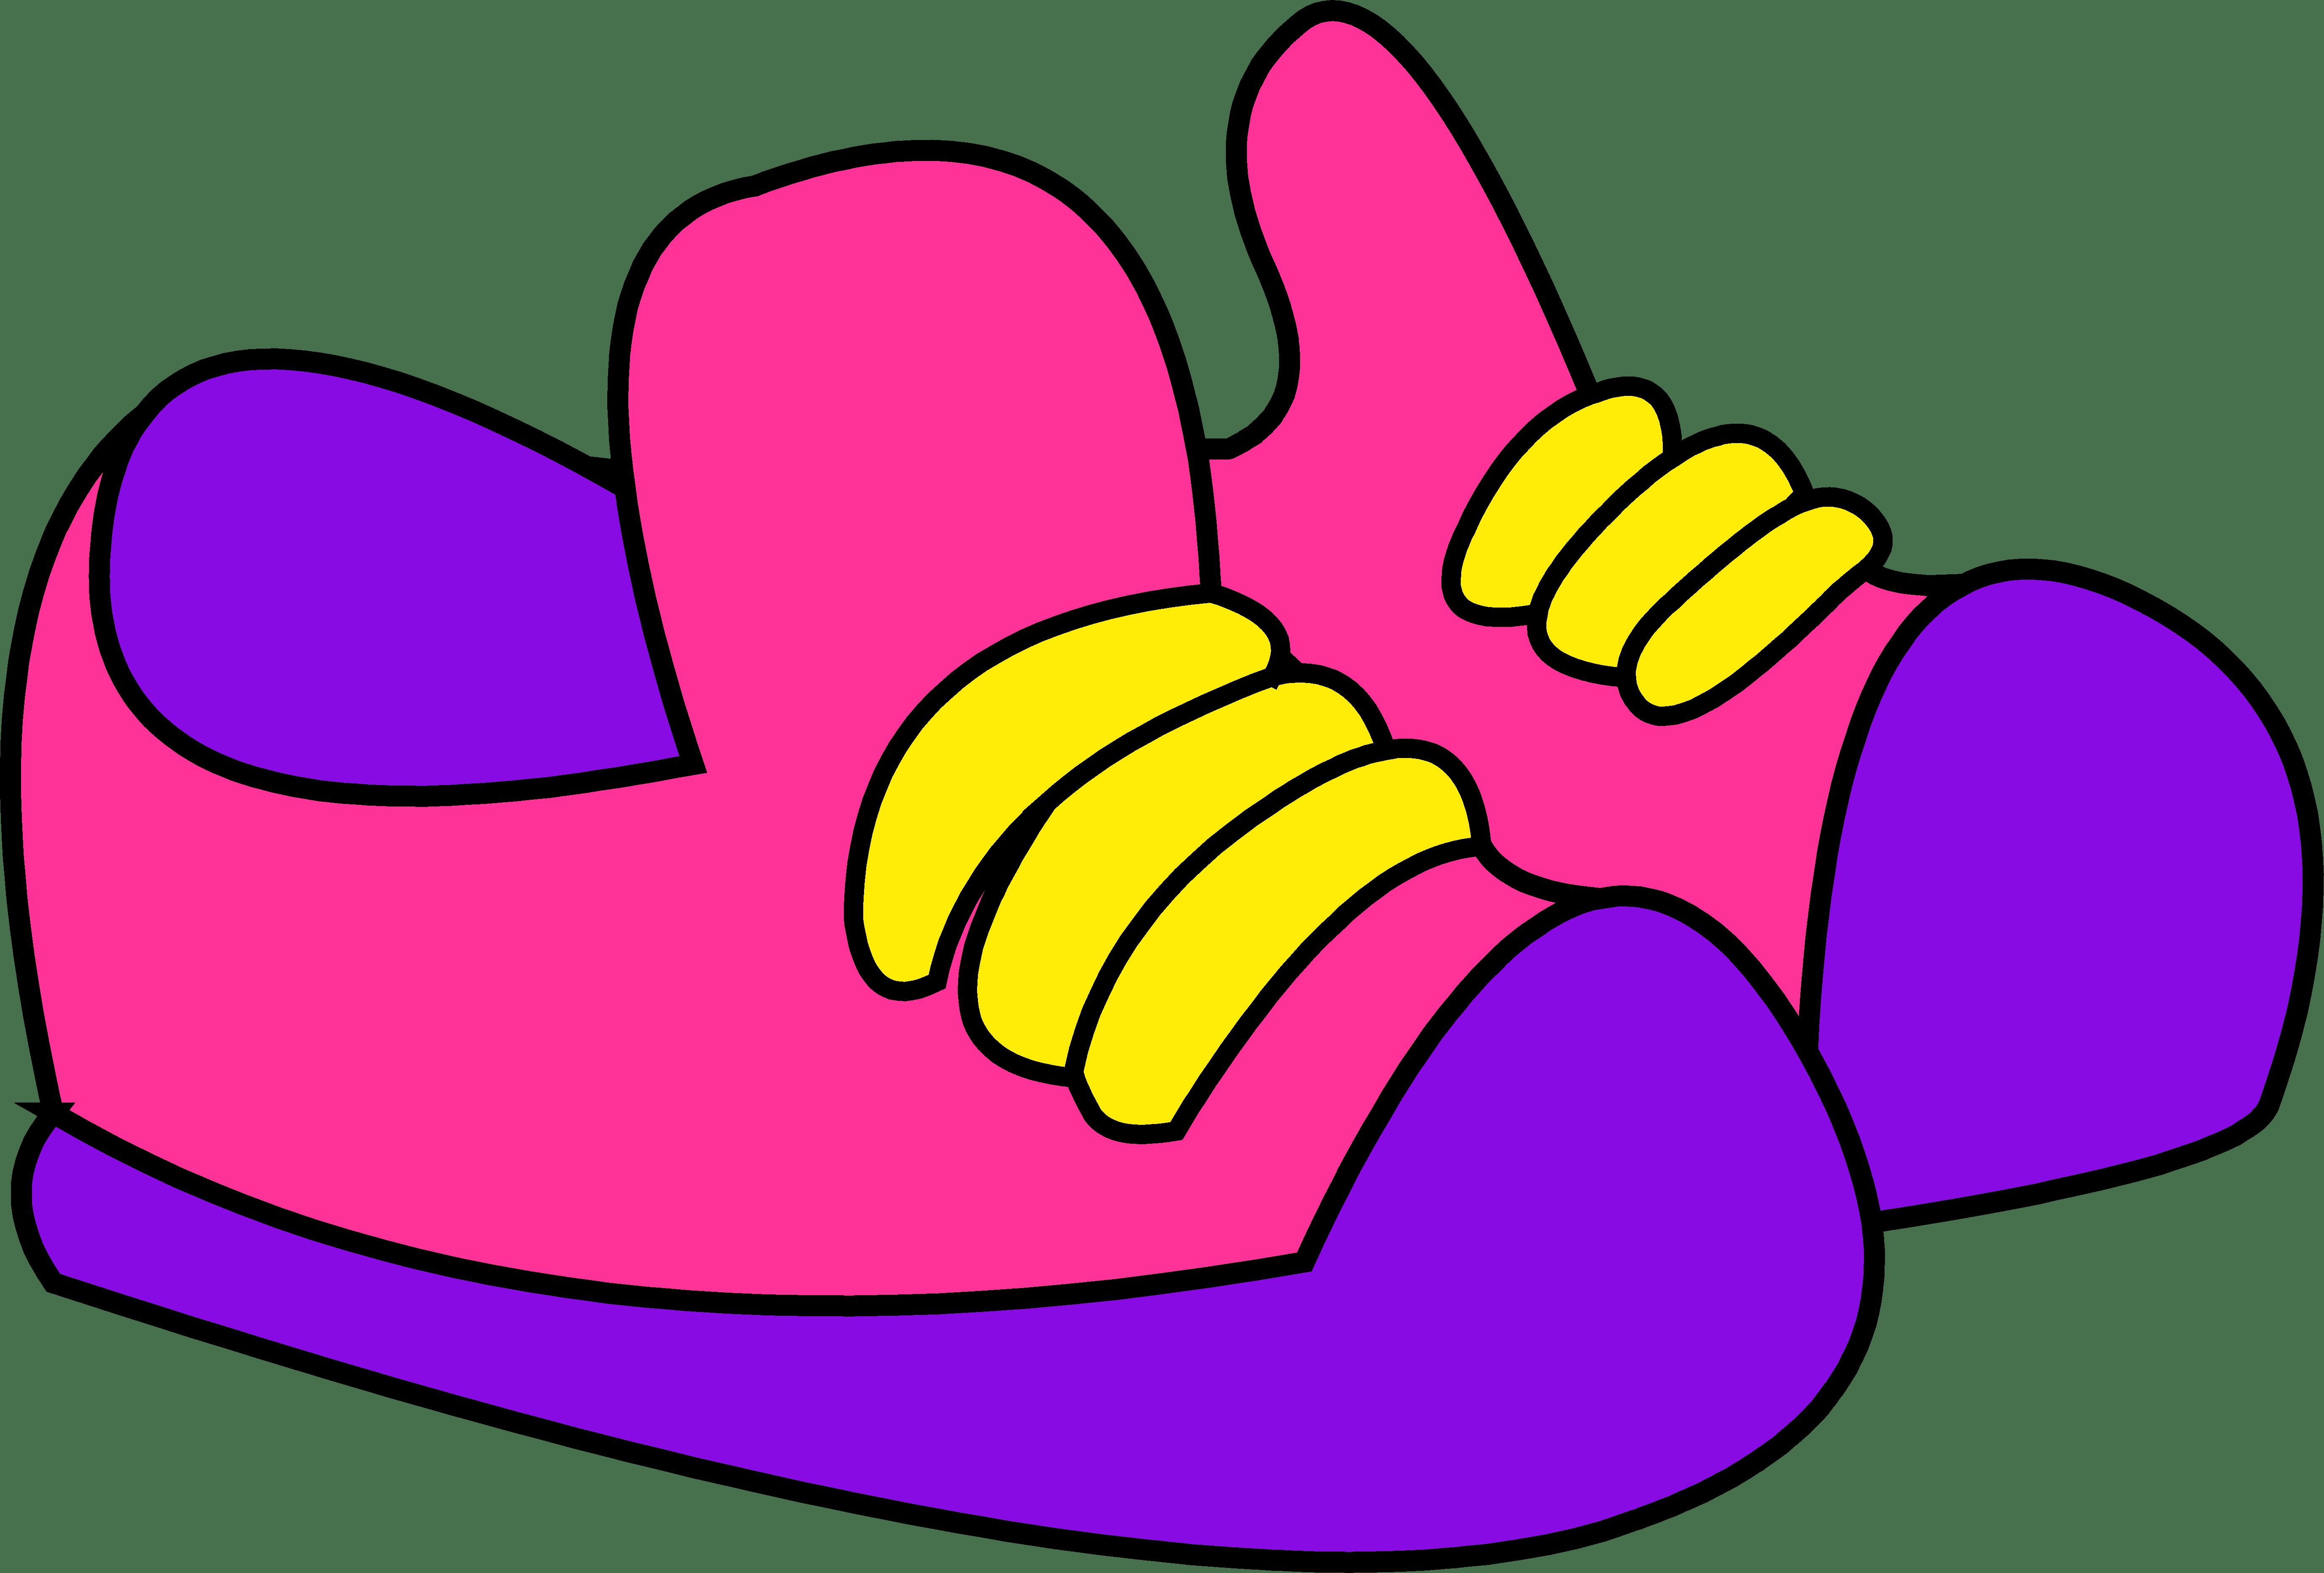 Clipart cartoon shoes clipart free Cartoon shoes clipart 4 » Clipart Portal clipart free